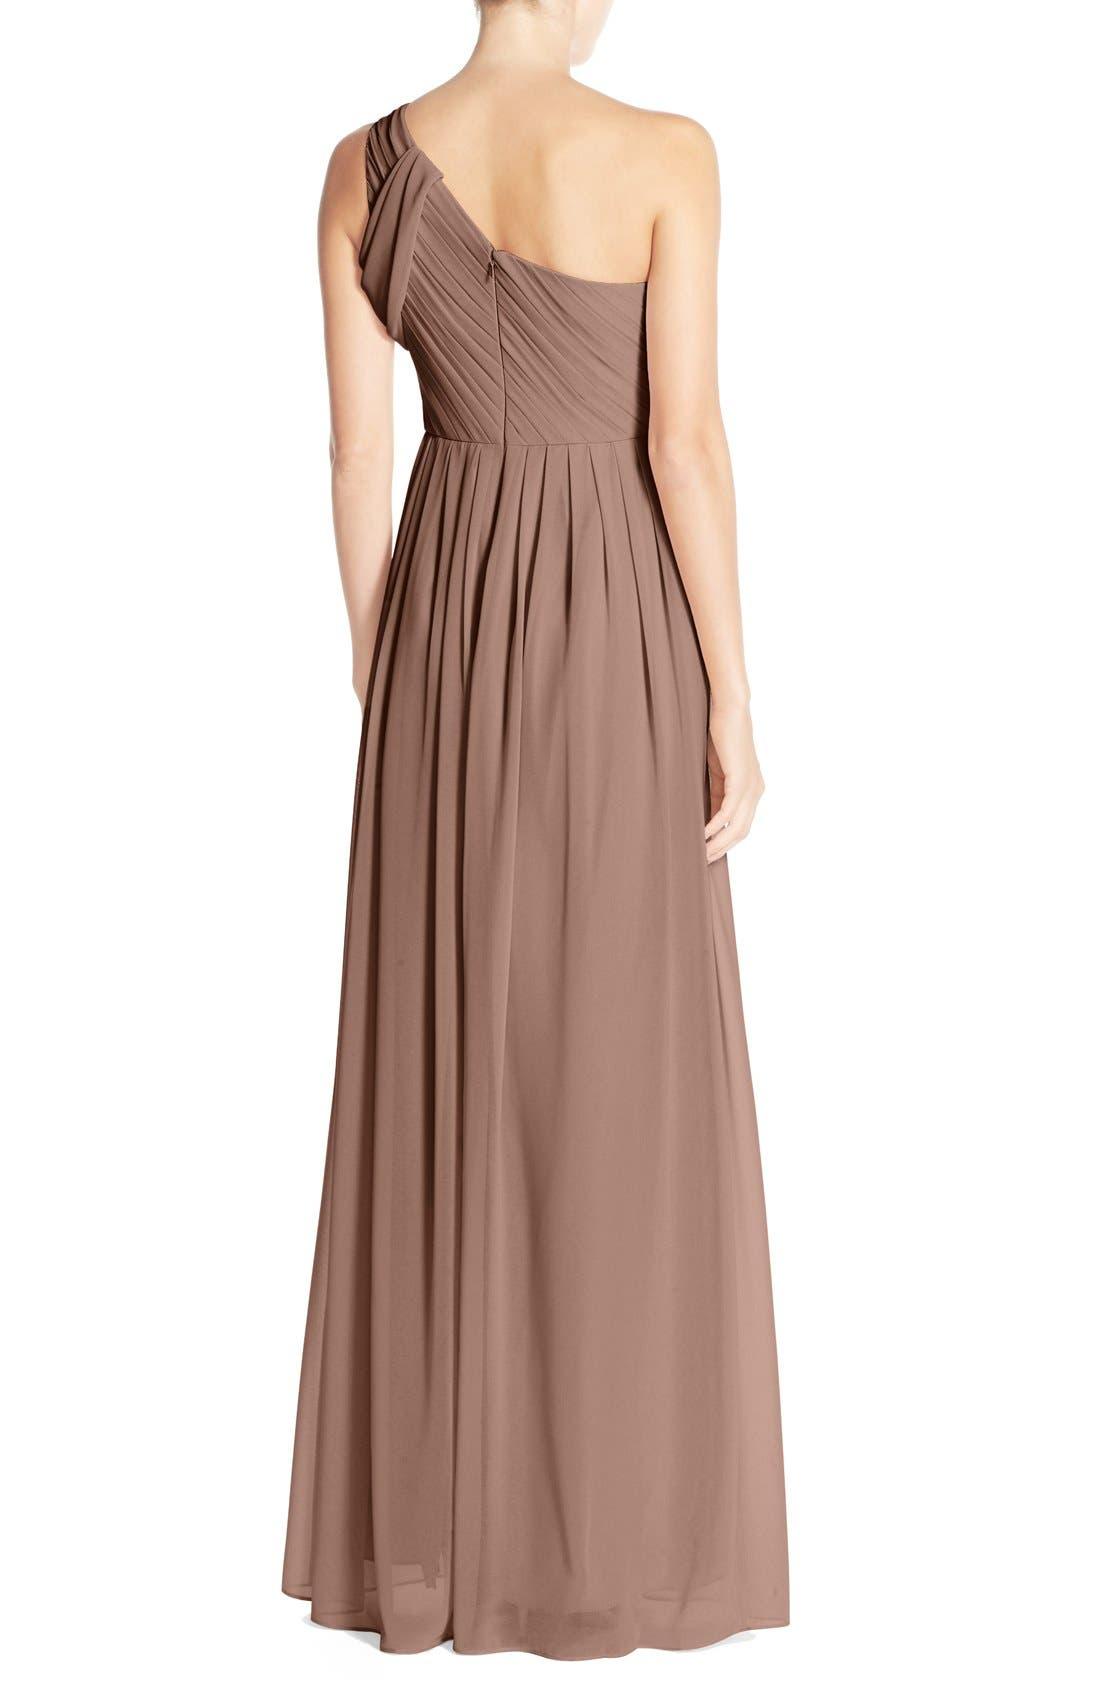 'Chloe' One-Shoulder Pleat Chiffon Gown,                             Alternate thumbnail 2, color,                             Hibiscus Tea